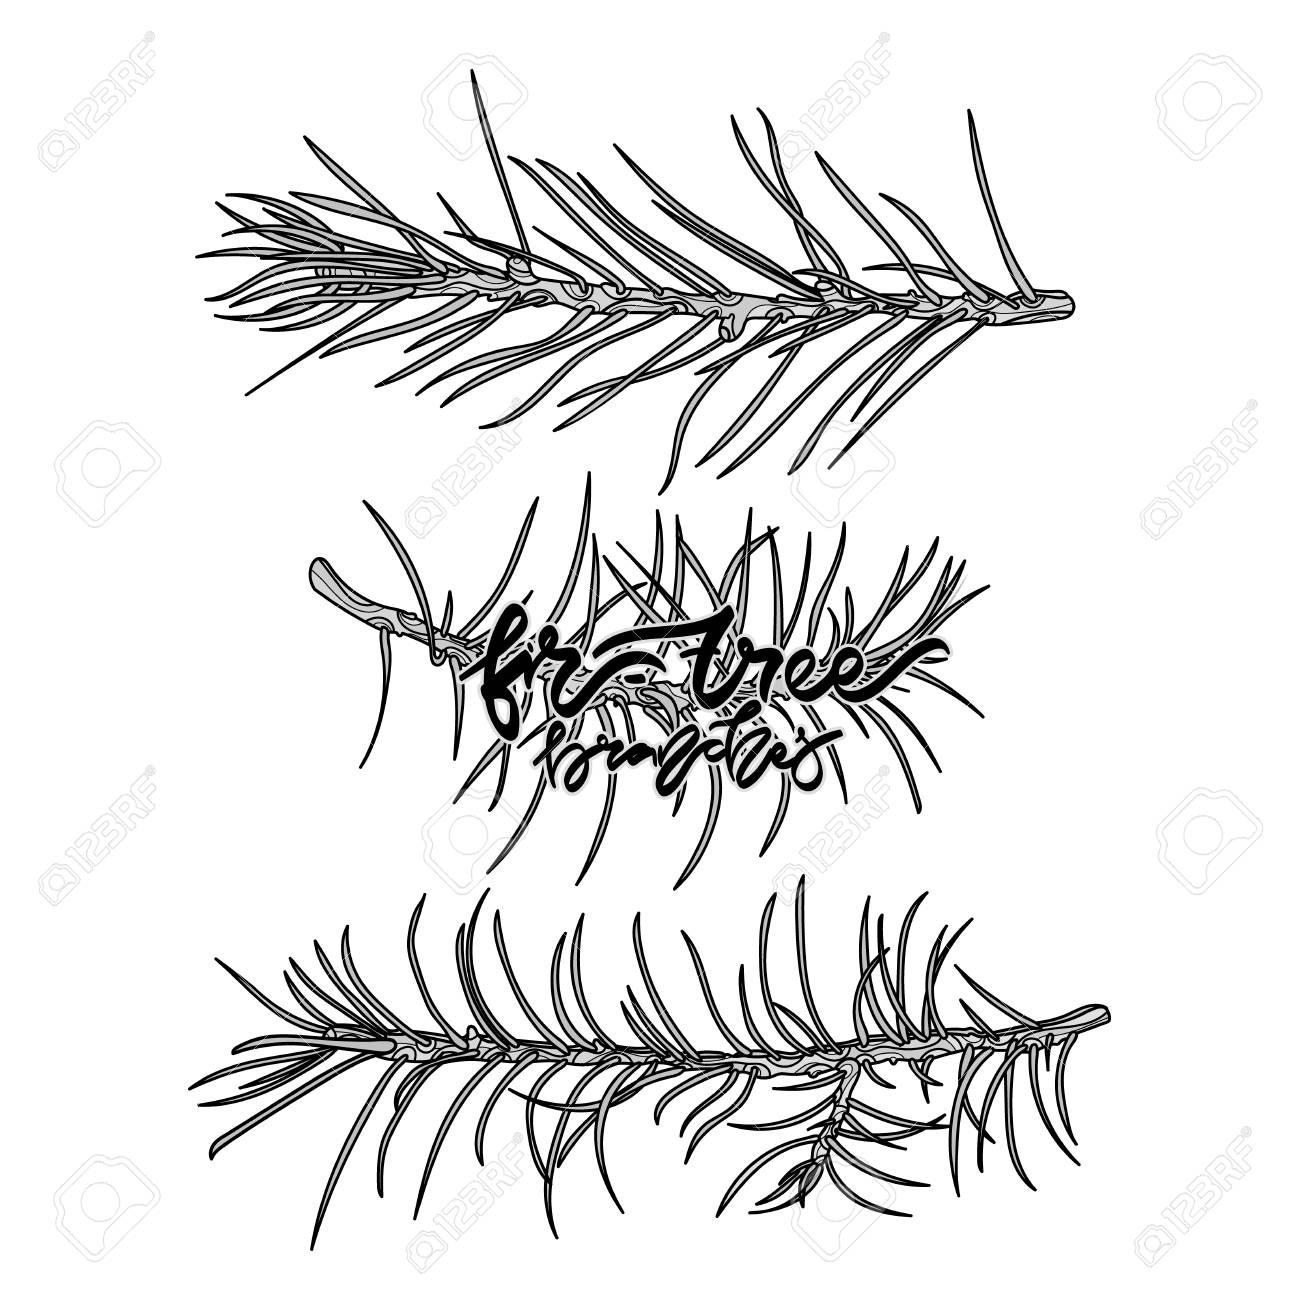 fir tree monochrome branches vector illustration hand drawn  fir tree monochrome branches vector illustration hand drawn lettering